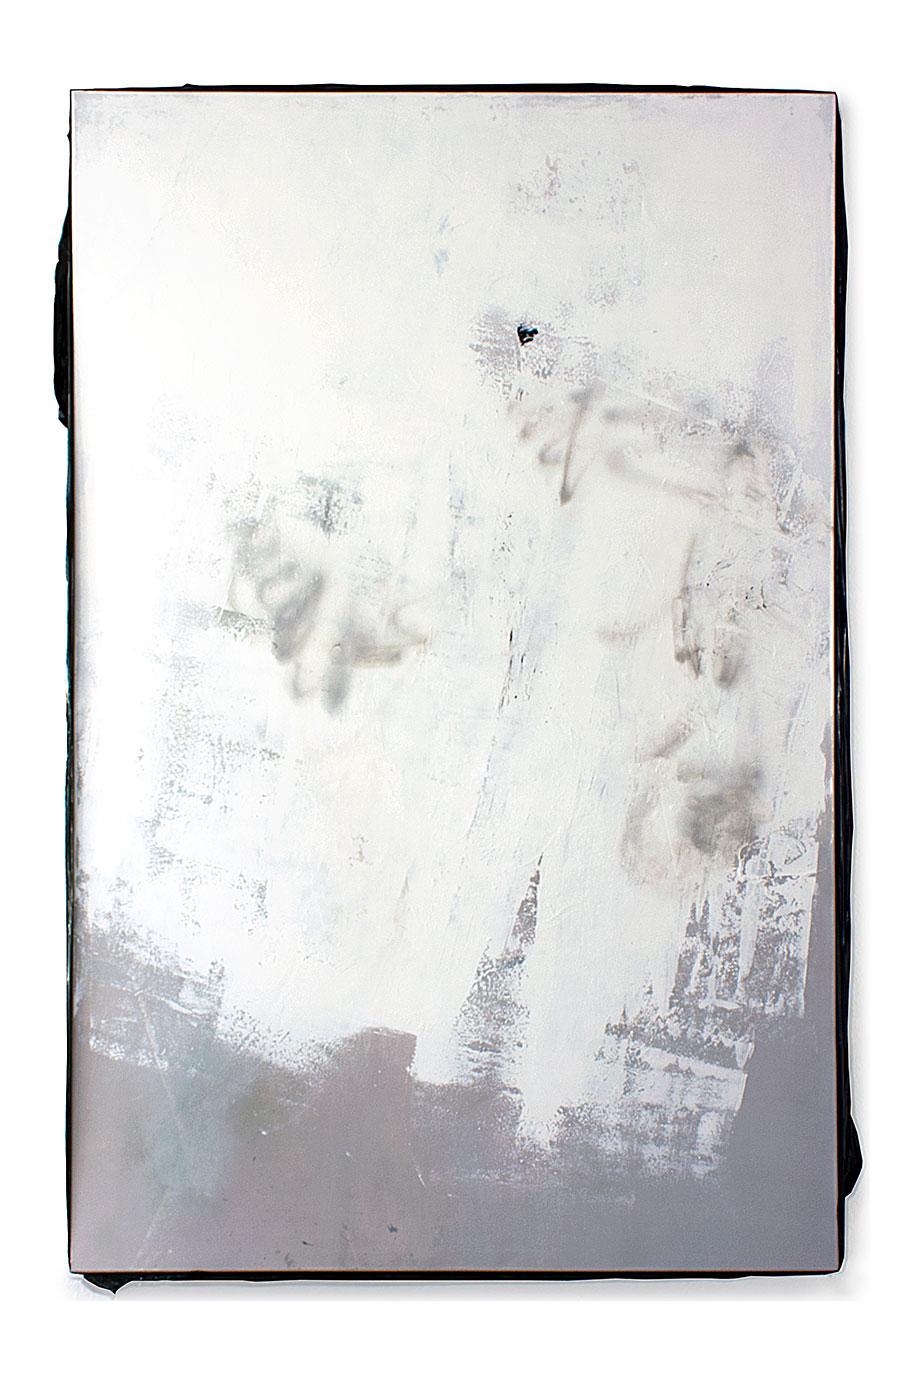 <b>Title:</b>140803<br /><b>Year:</b>2014<br /><b>Medium:</b>Acrylic, lacquer, spray paint, and PE film on canvas<br /><b>Size:</b>240 x 160 cm